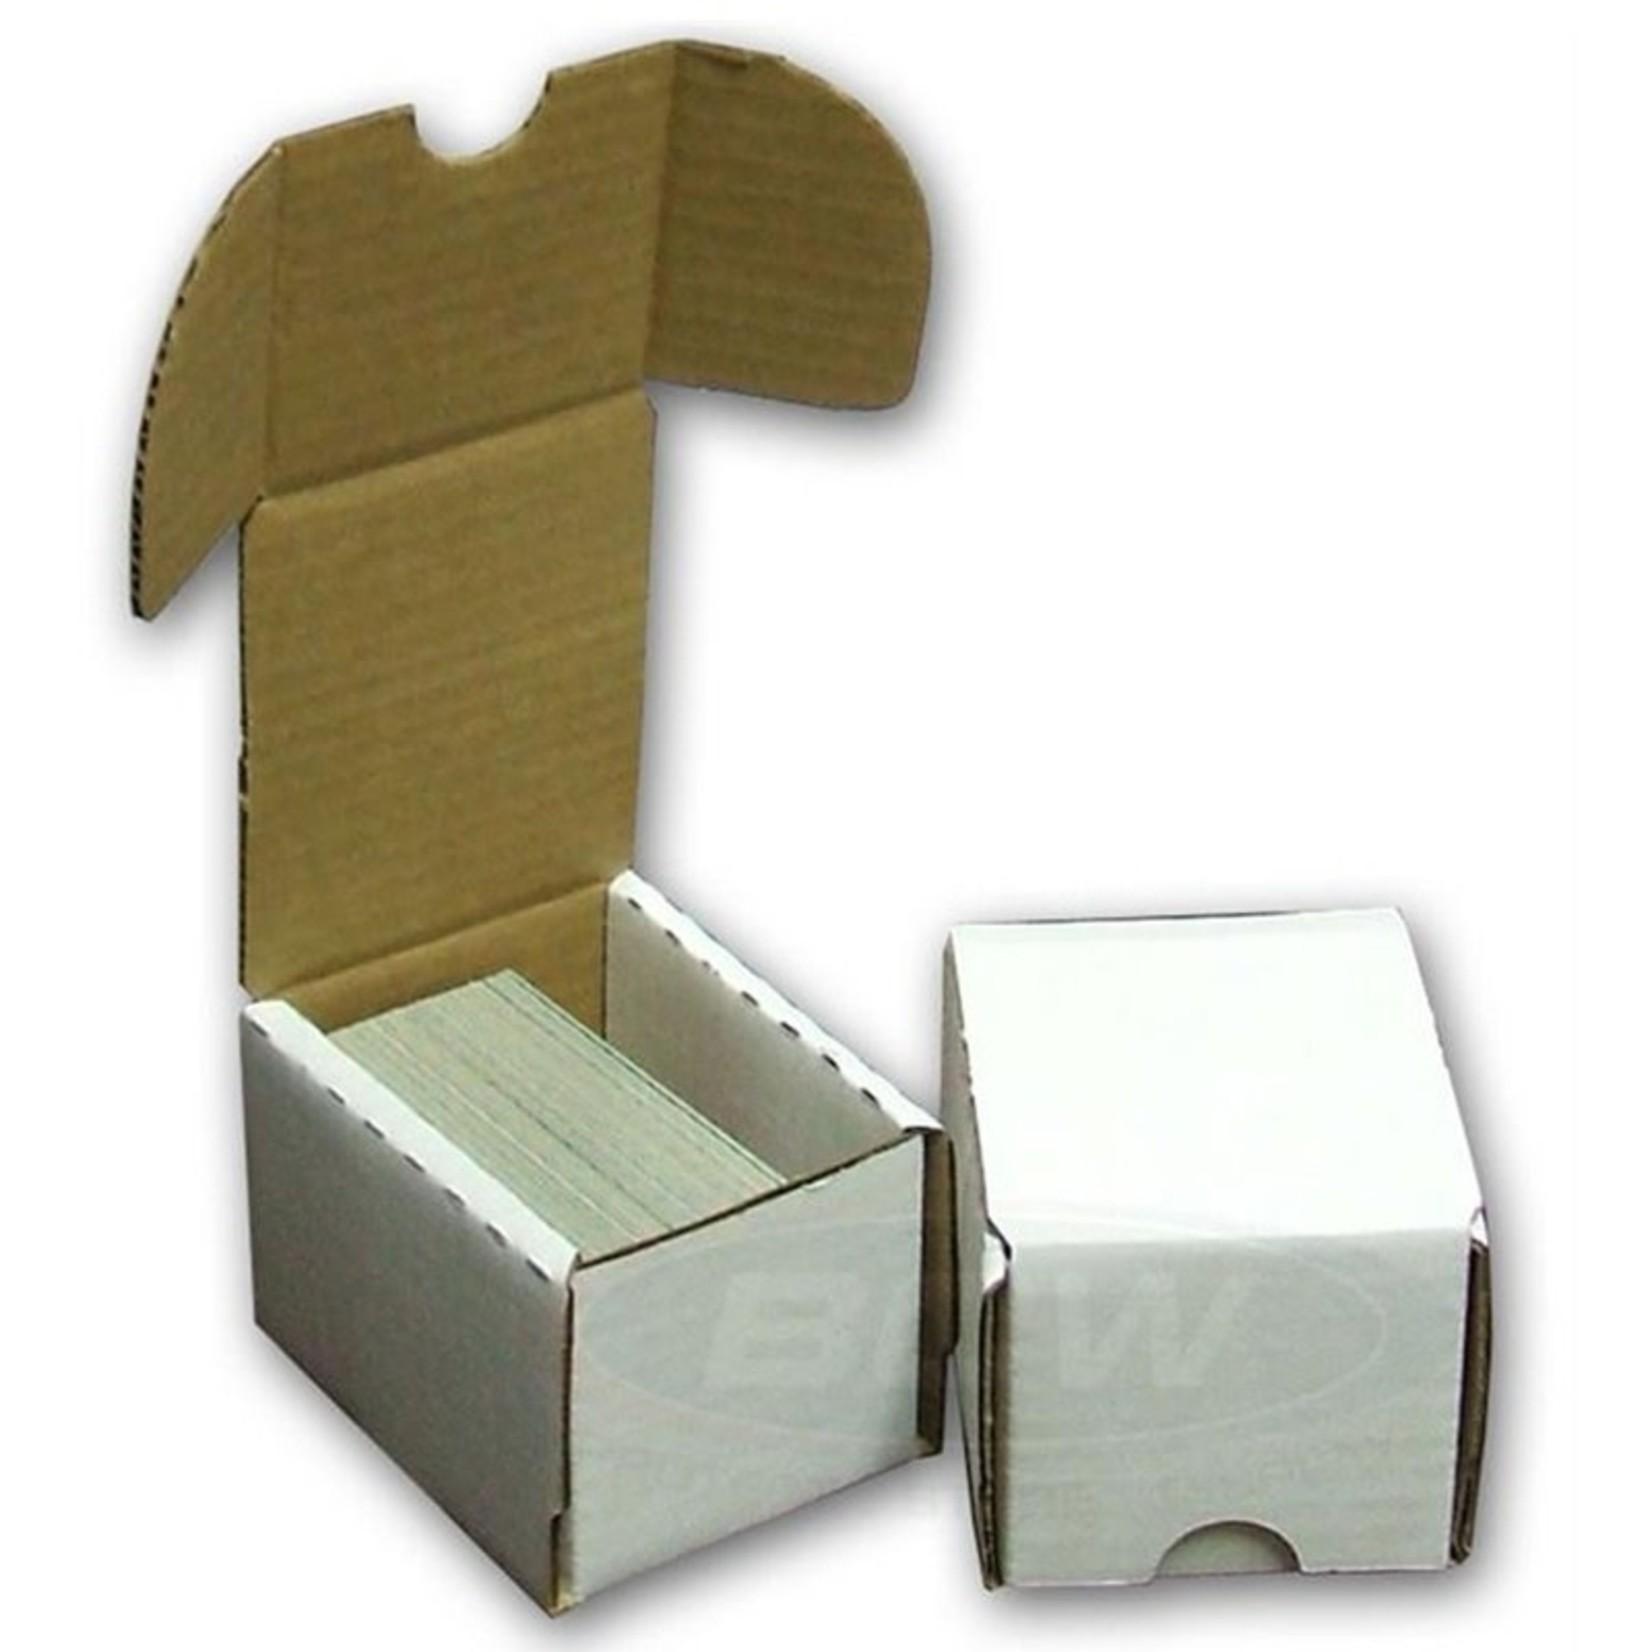 BCW Cardboard Box: 100 Ct